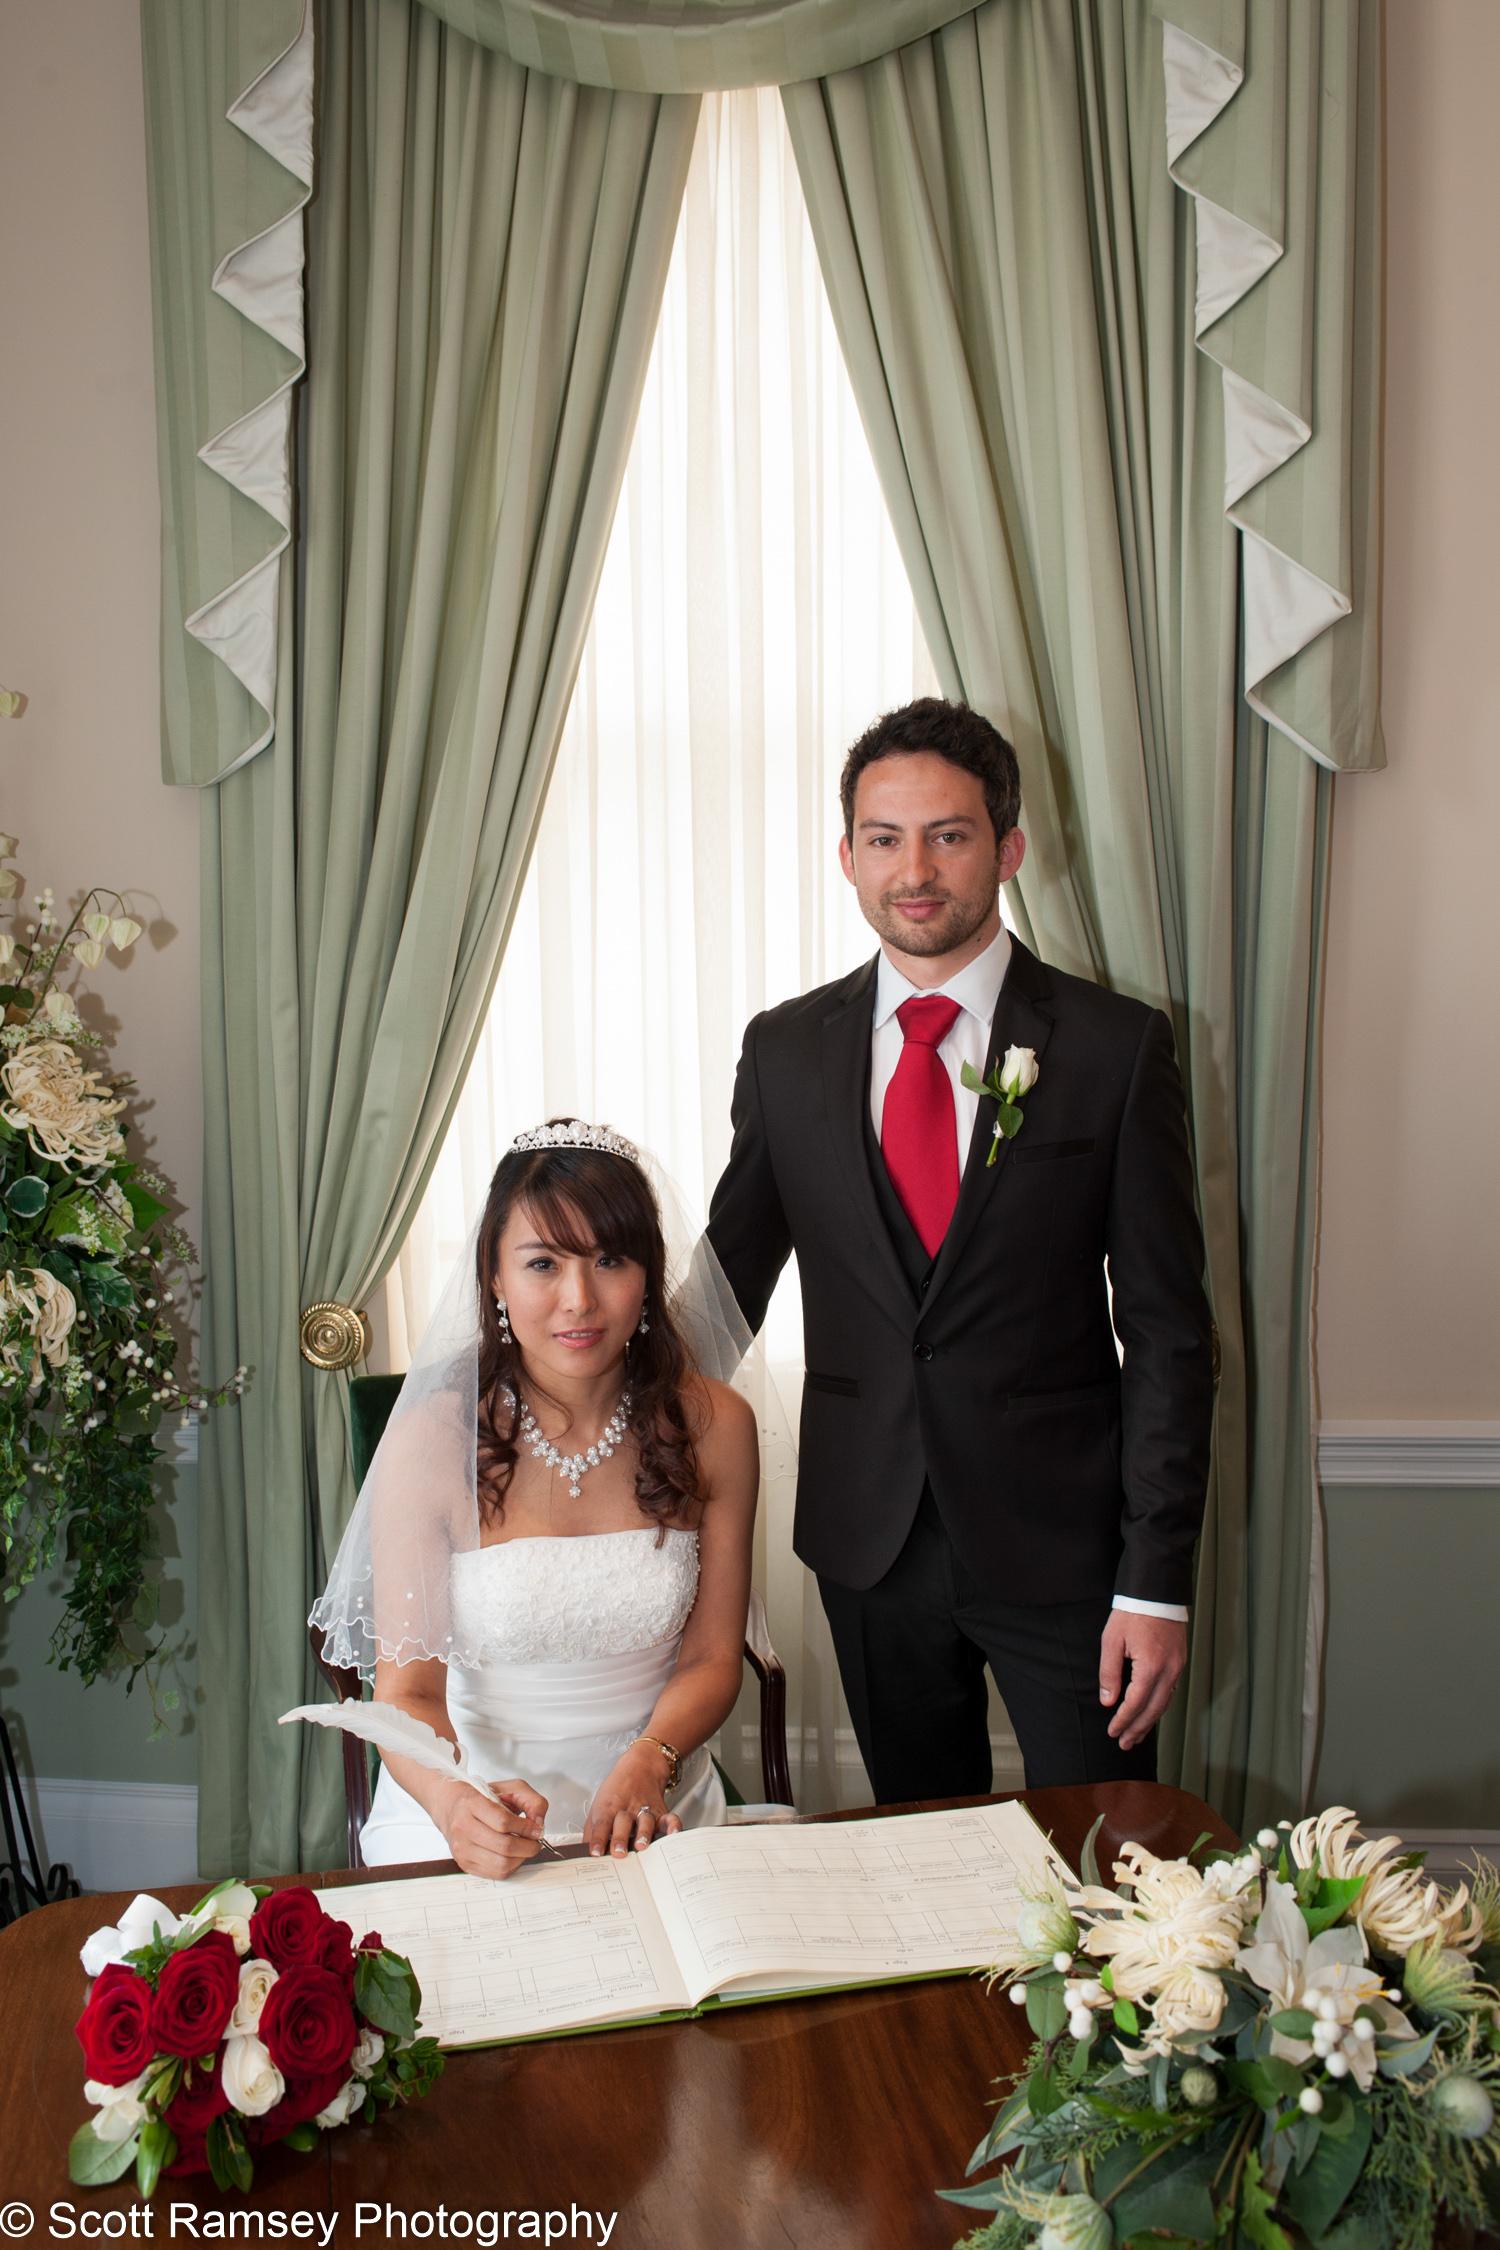 Portsmouth Registry Office Wedding Couple Sign Register 040513-21